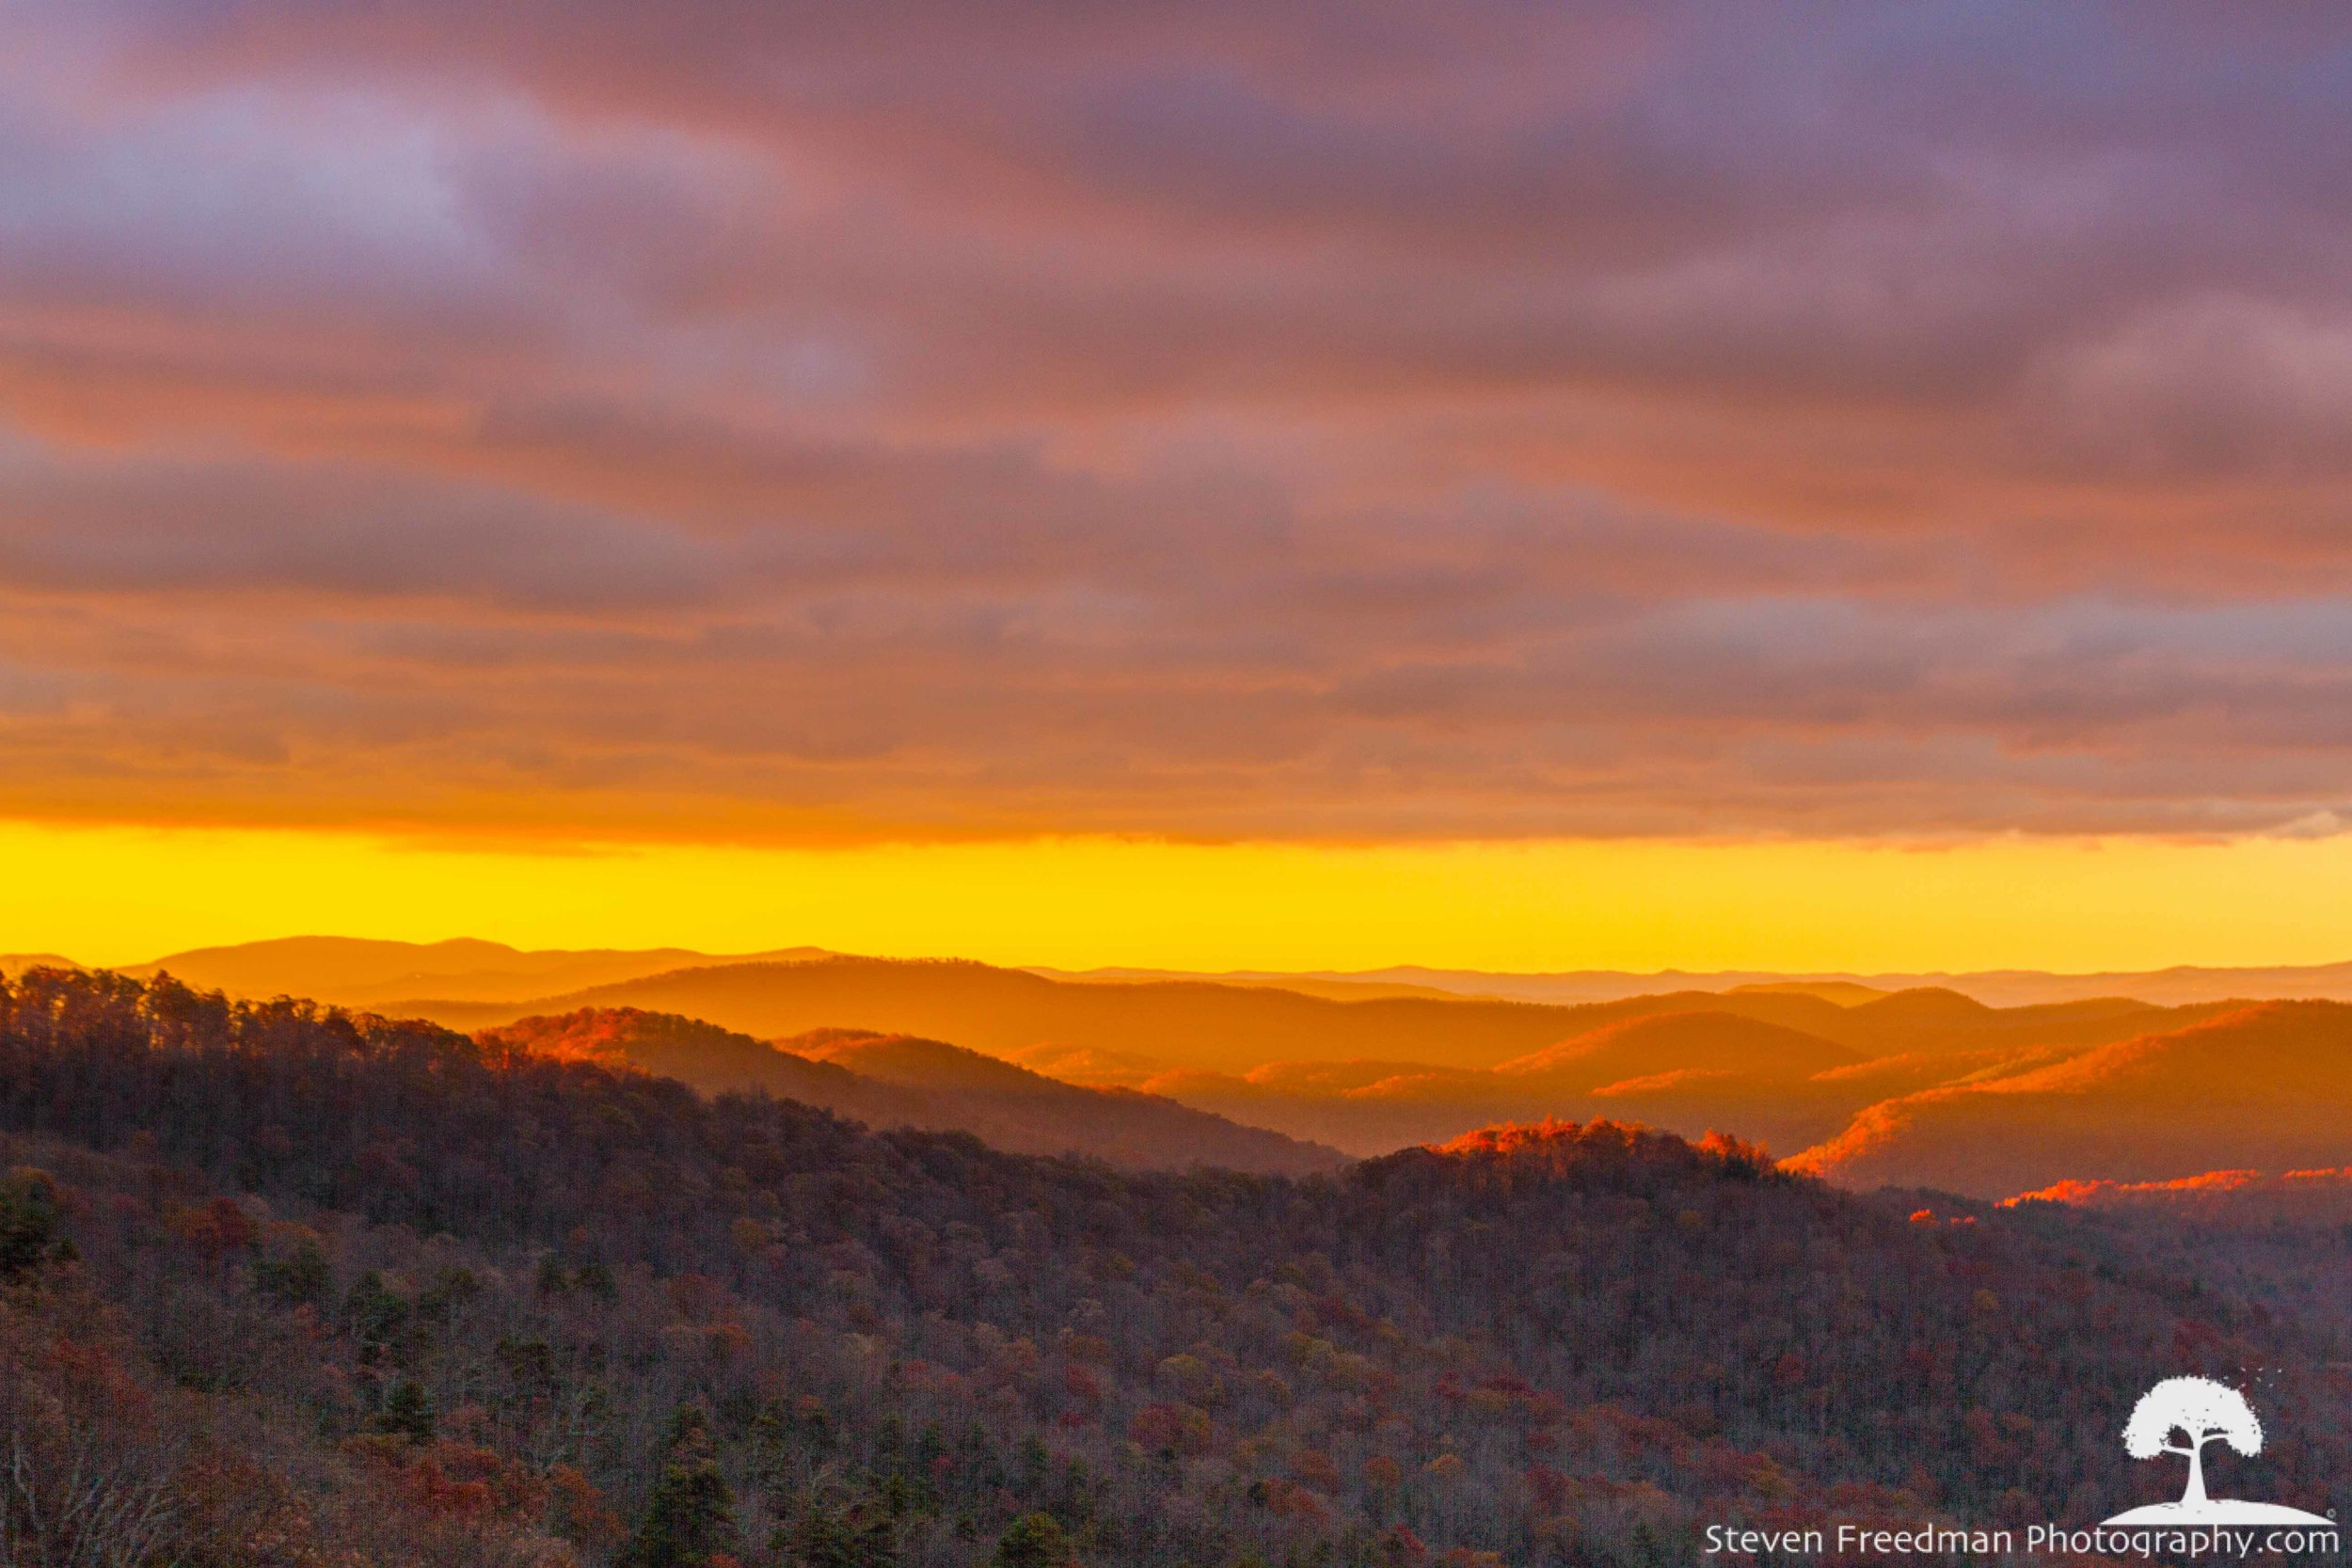 Sunrise at Bad Fork Valley